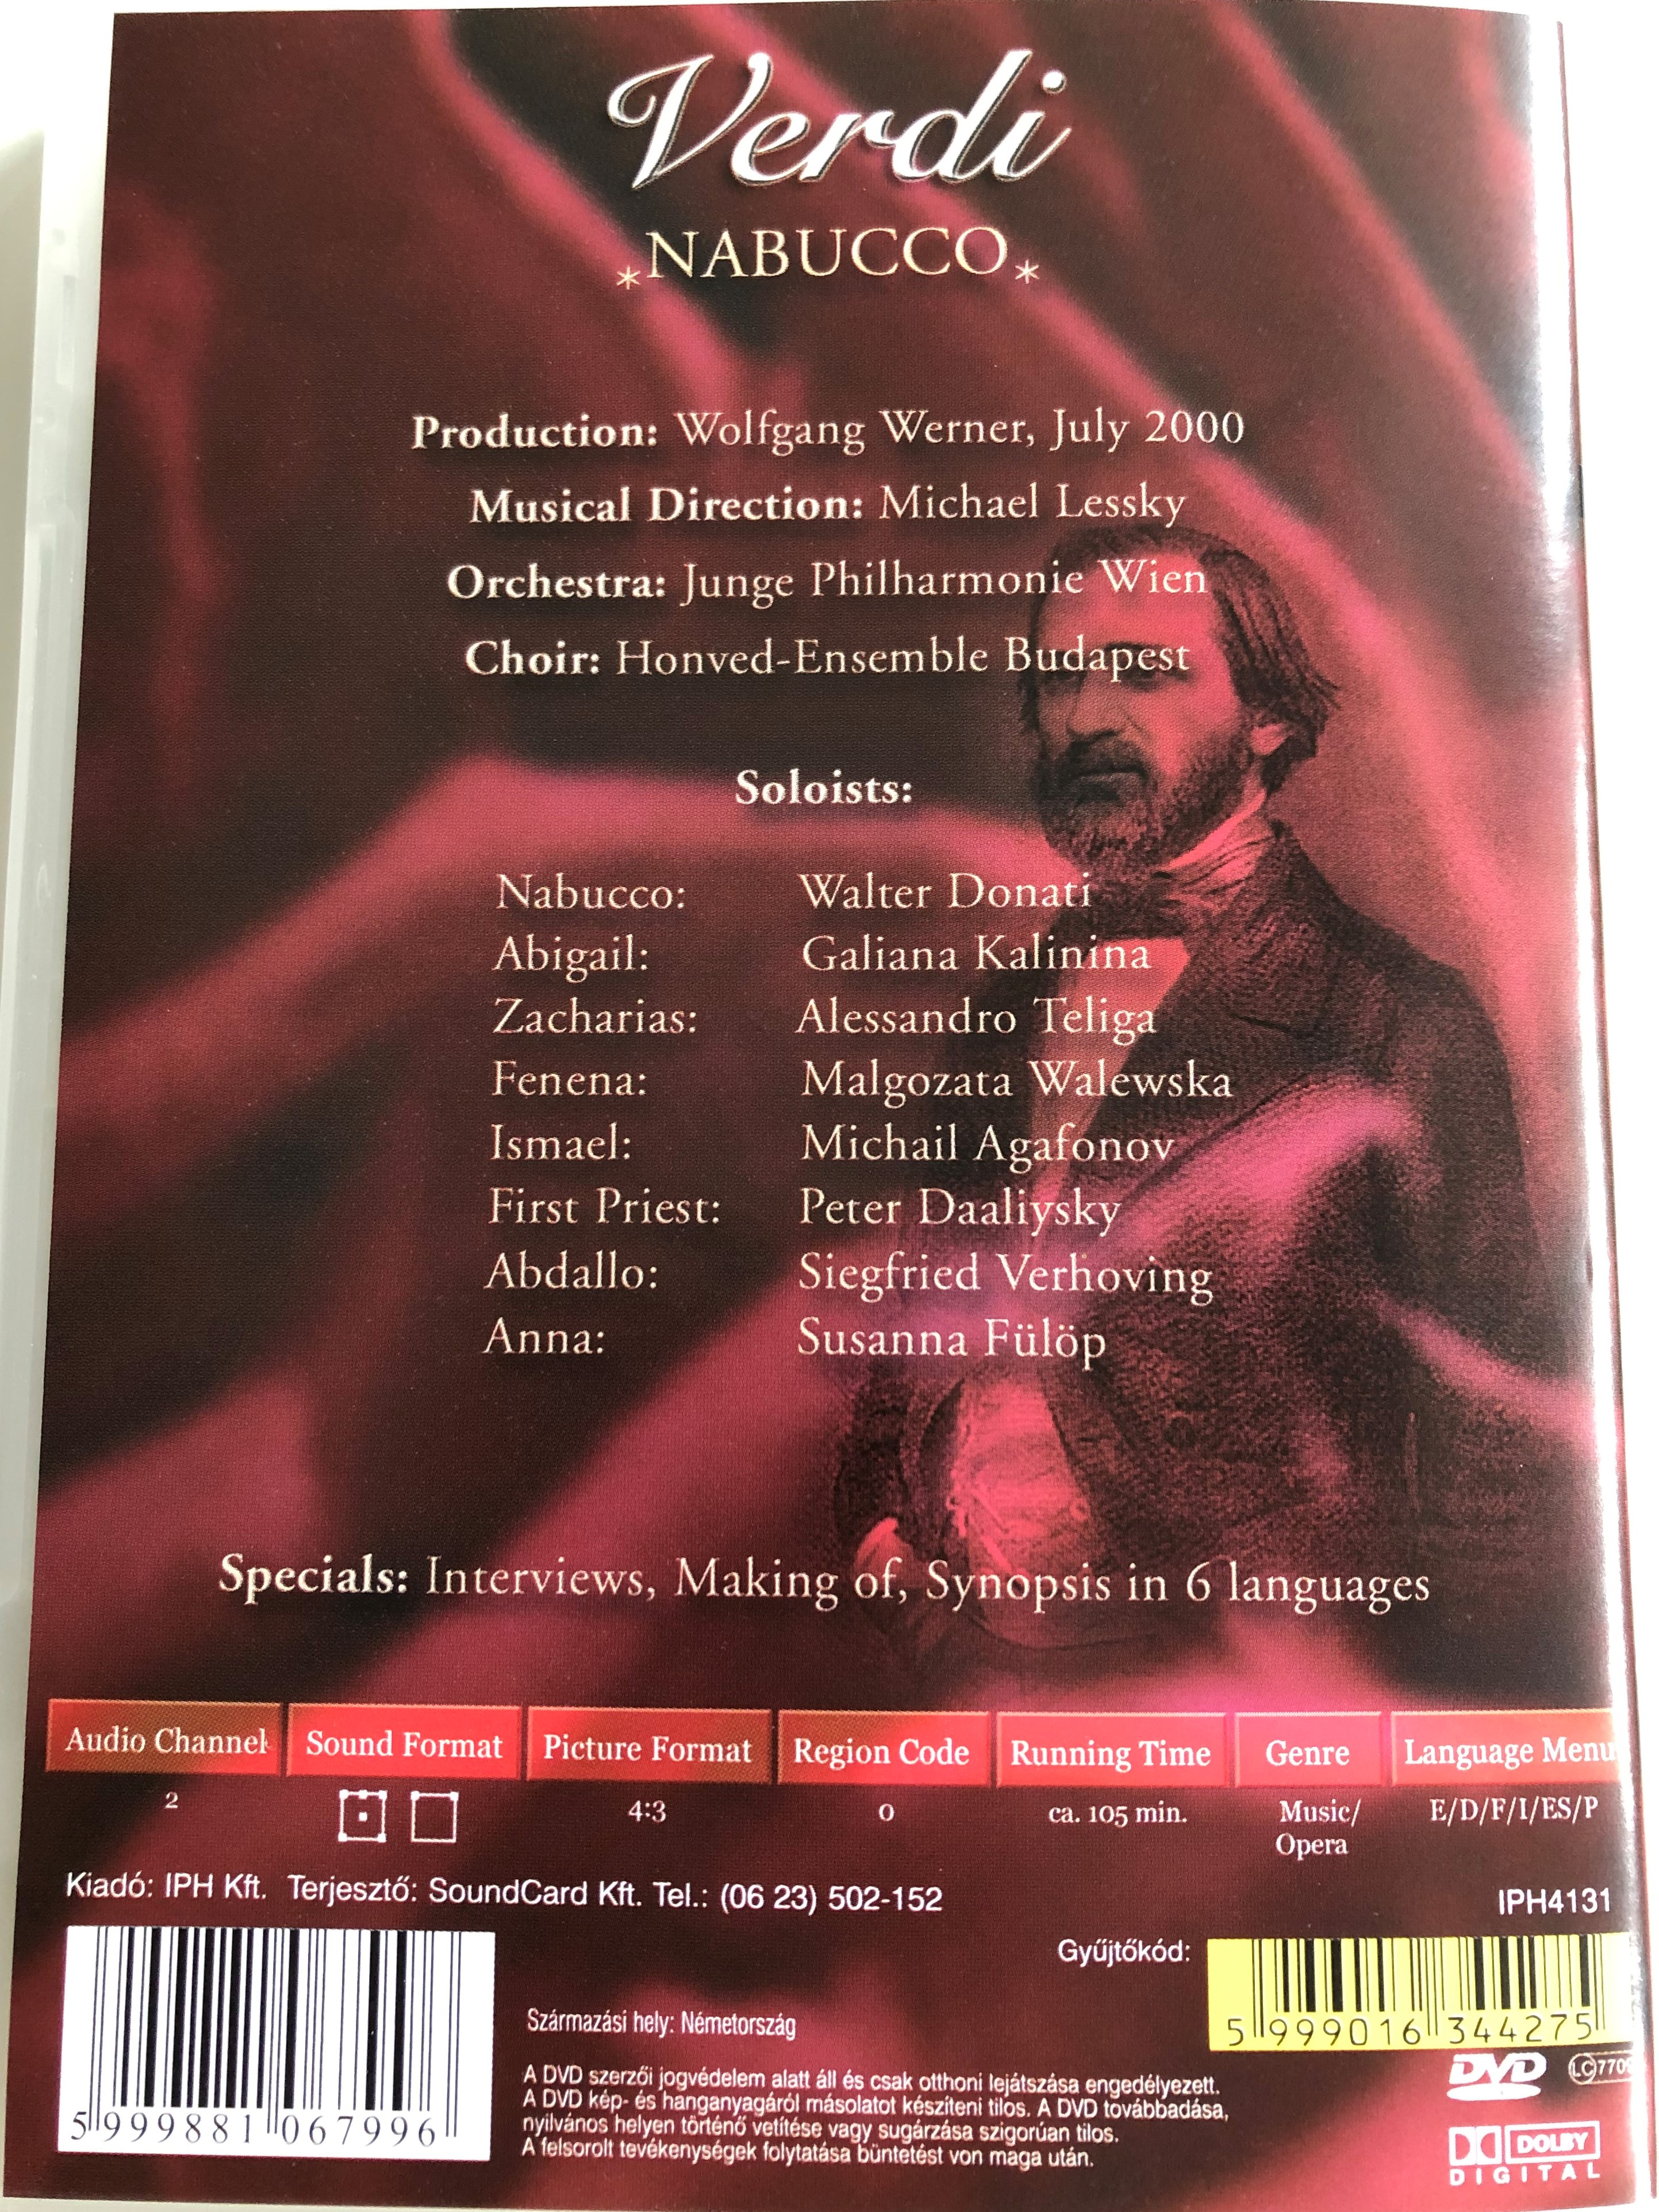 verdi-nabucco-dvd-2000-opera-in-4-acts-4.jpg